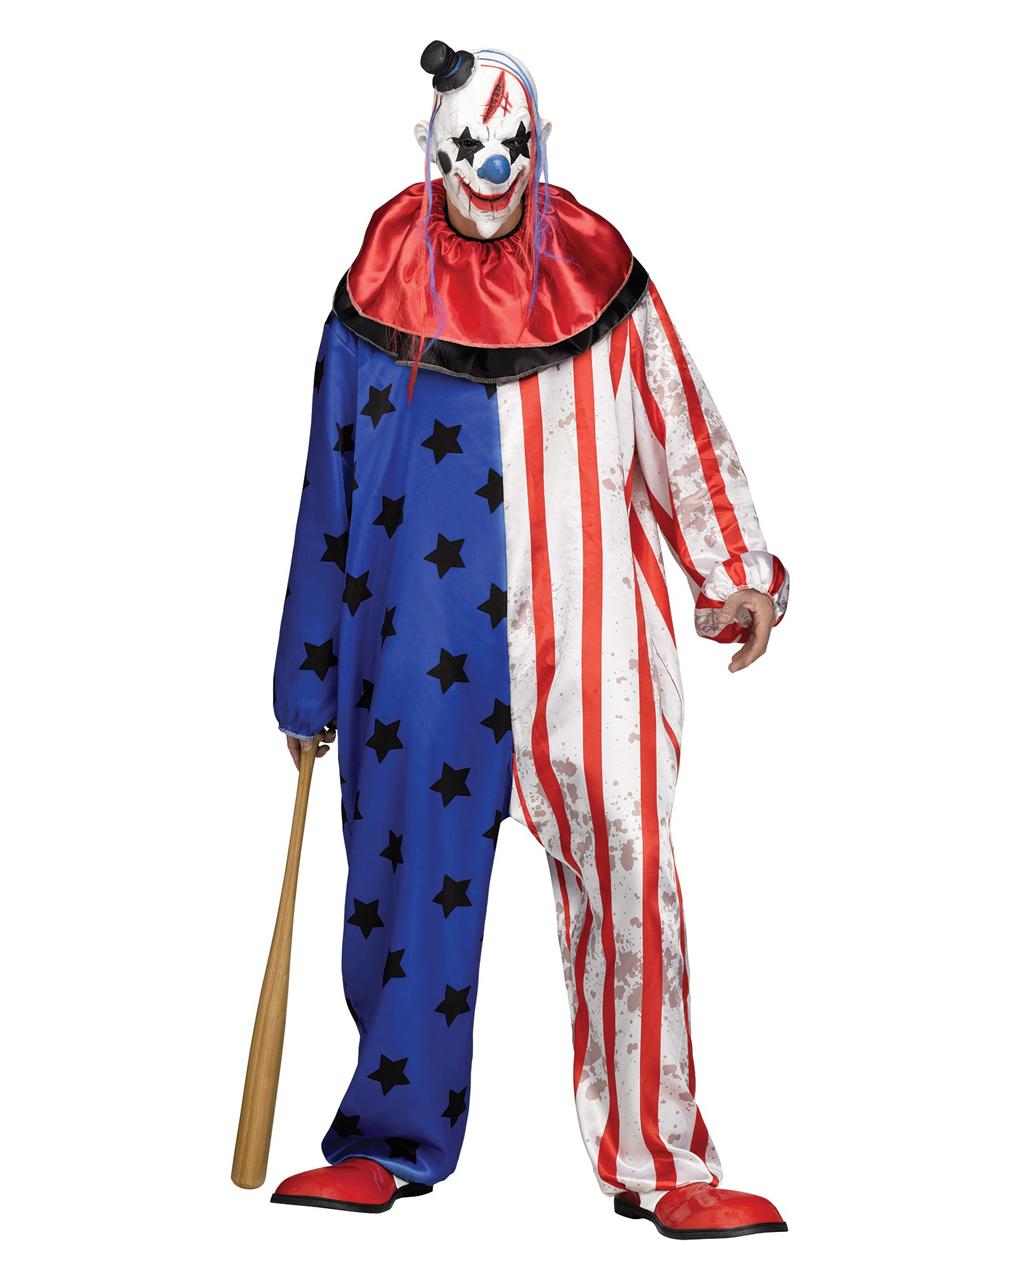 horror zirkus clown kost m mit maske halloween clown verkleidung horror. Black Bedroom Furniture Sets. Home Design Ideas